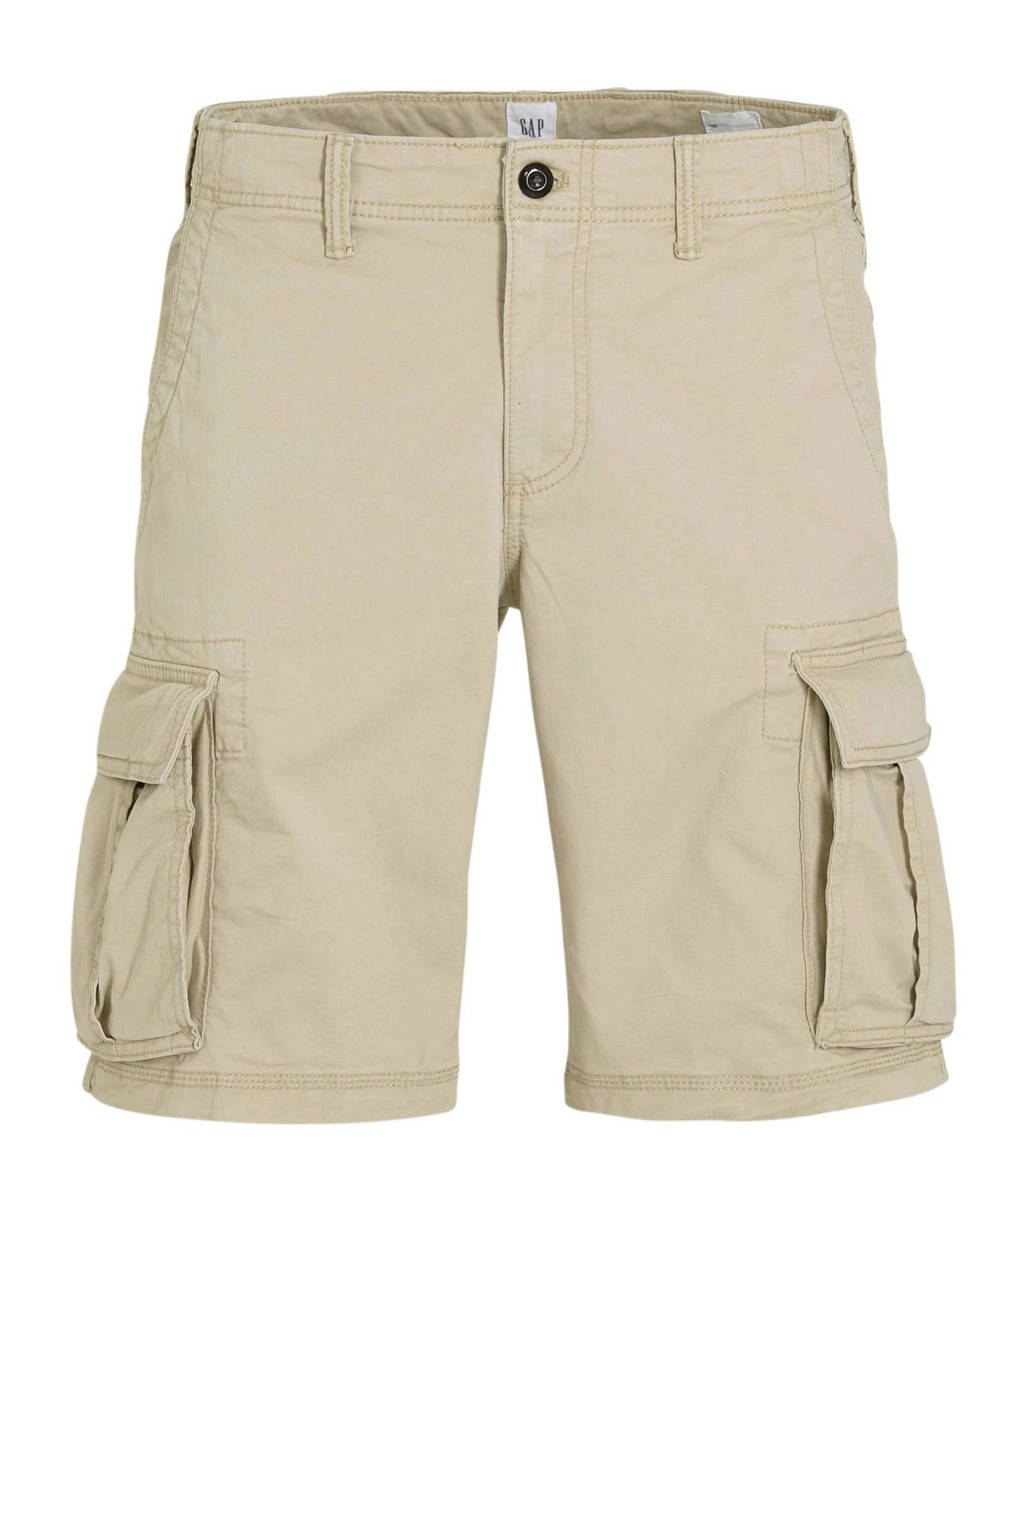 GAP regular fit cargo short beige, Beige